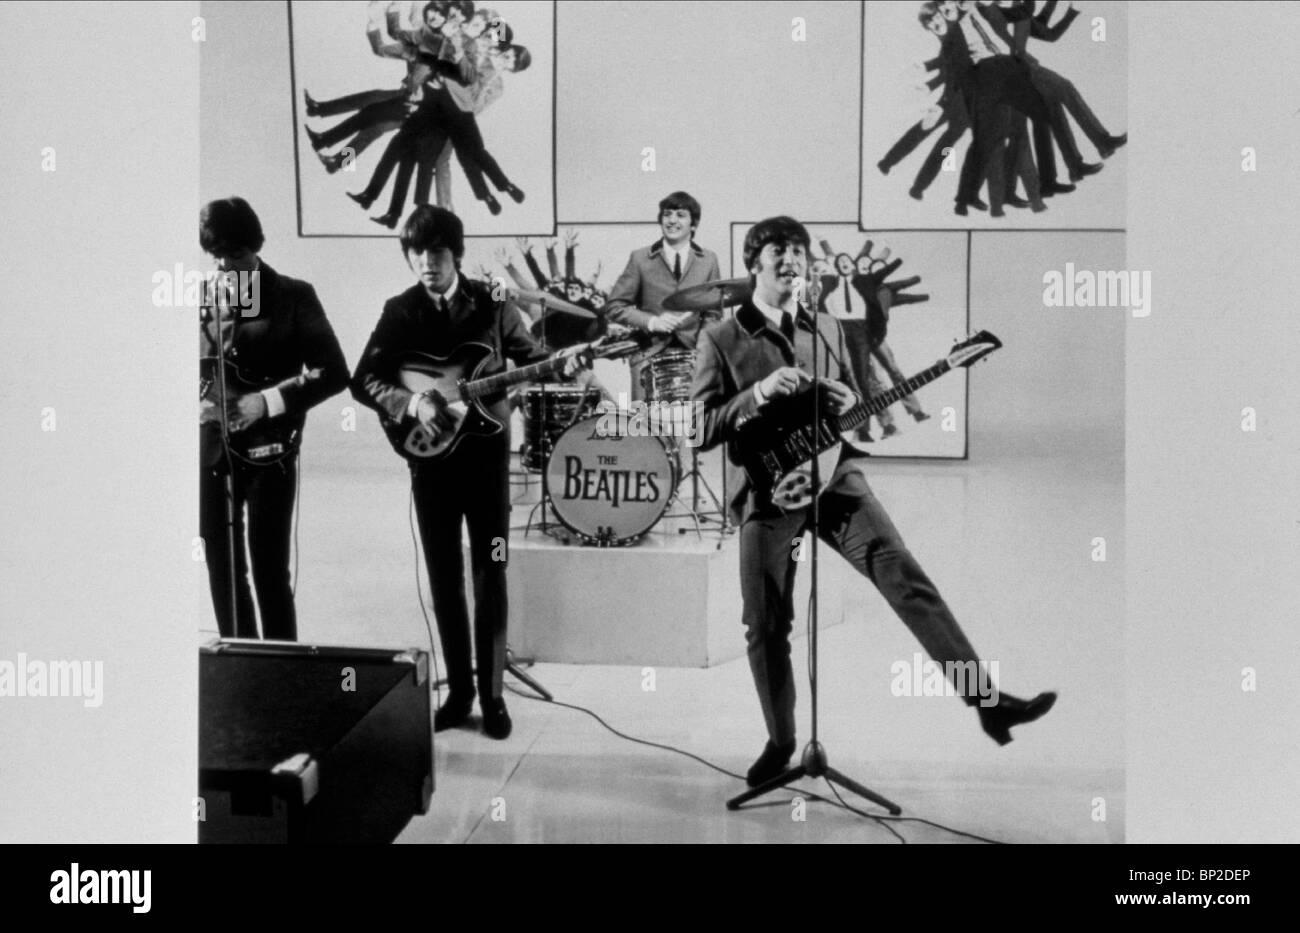 RINGO STARR GEORGE HARRISON JOHN LENNON PAUL MCCARTNEY A HARD DAY'S NIGHT BEATLES (1964) - Stock Image